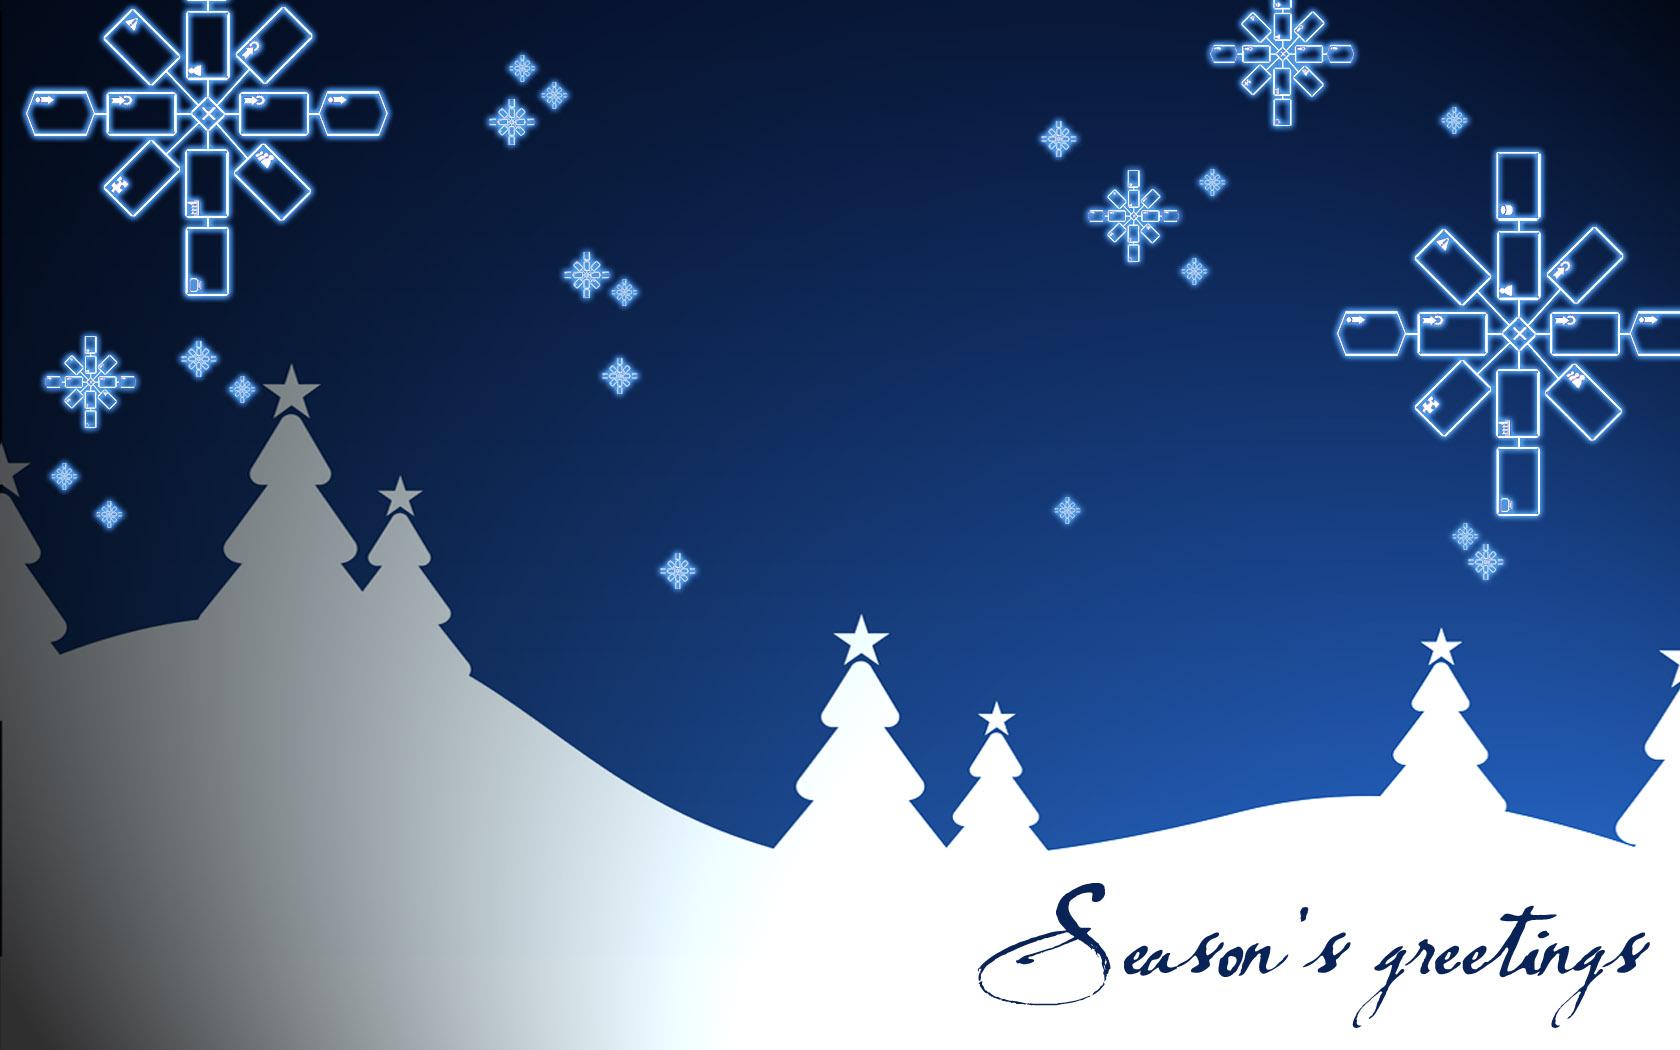 Seasons Greetings Wallpaper Now Available Aris Bpm Community